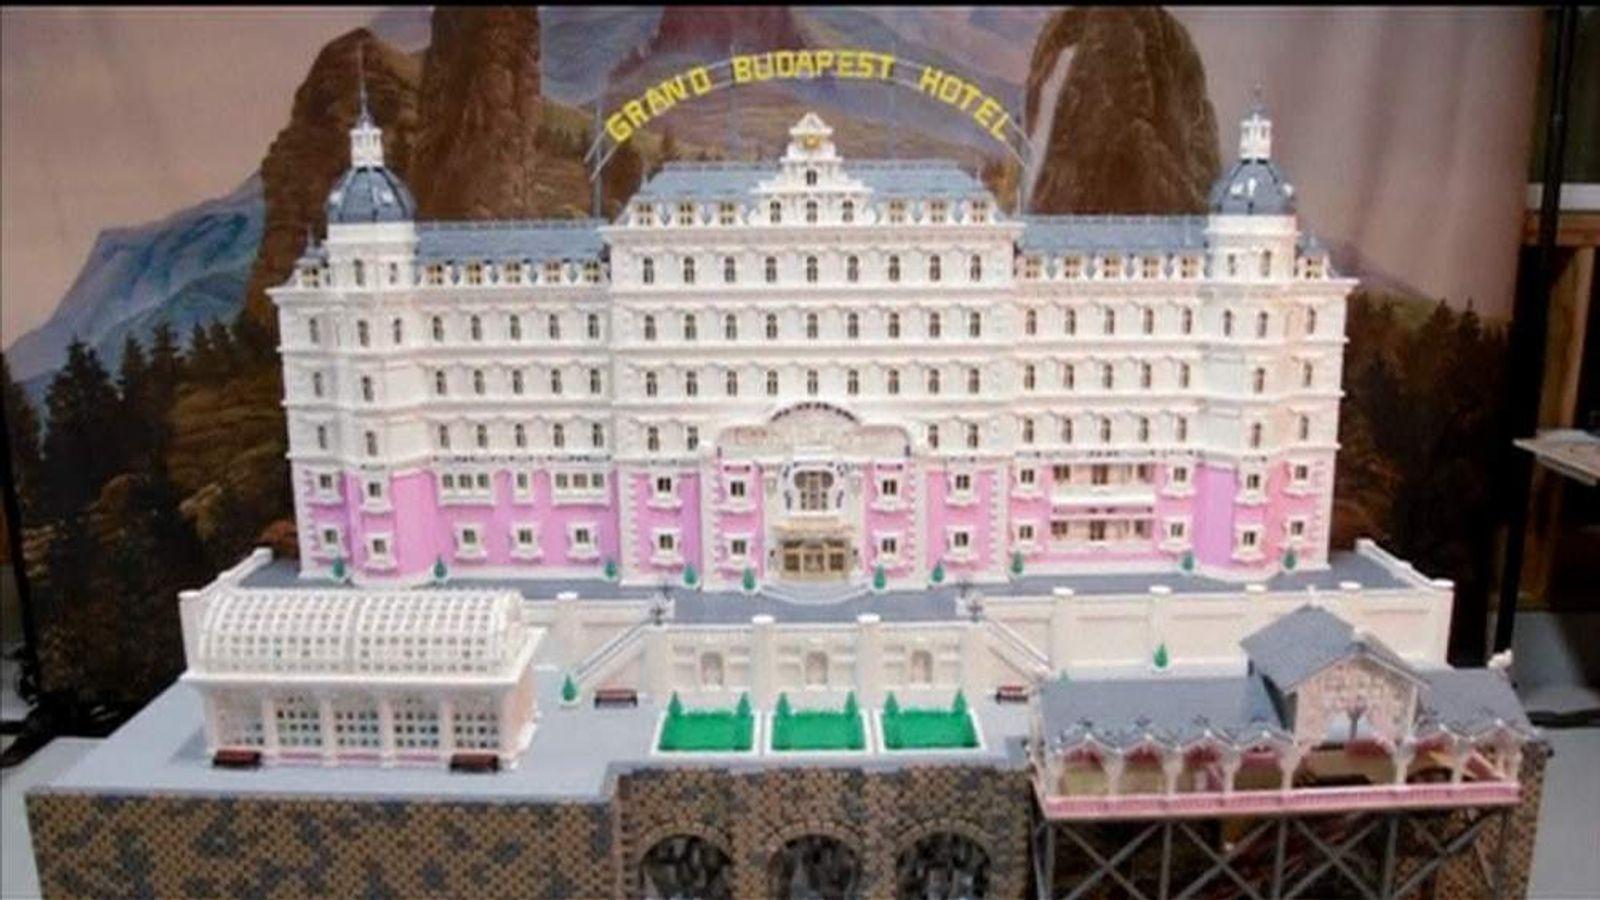 GRAND BUDAPEST HOTEL LEGO